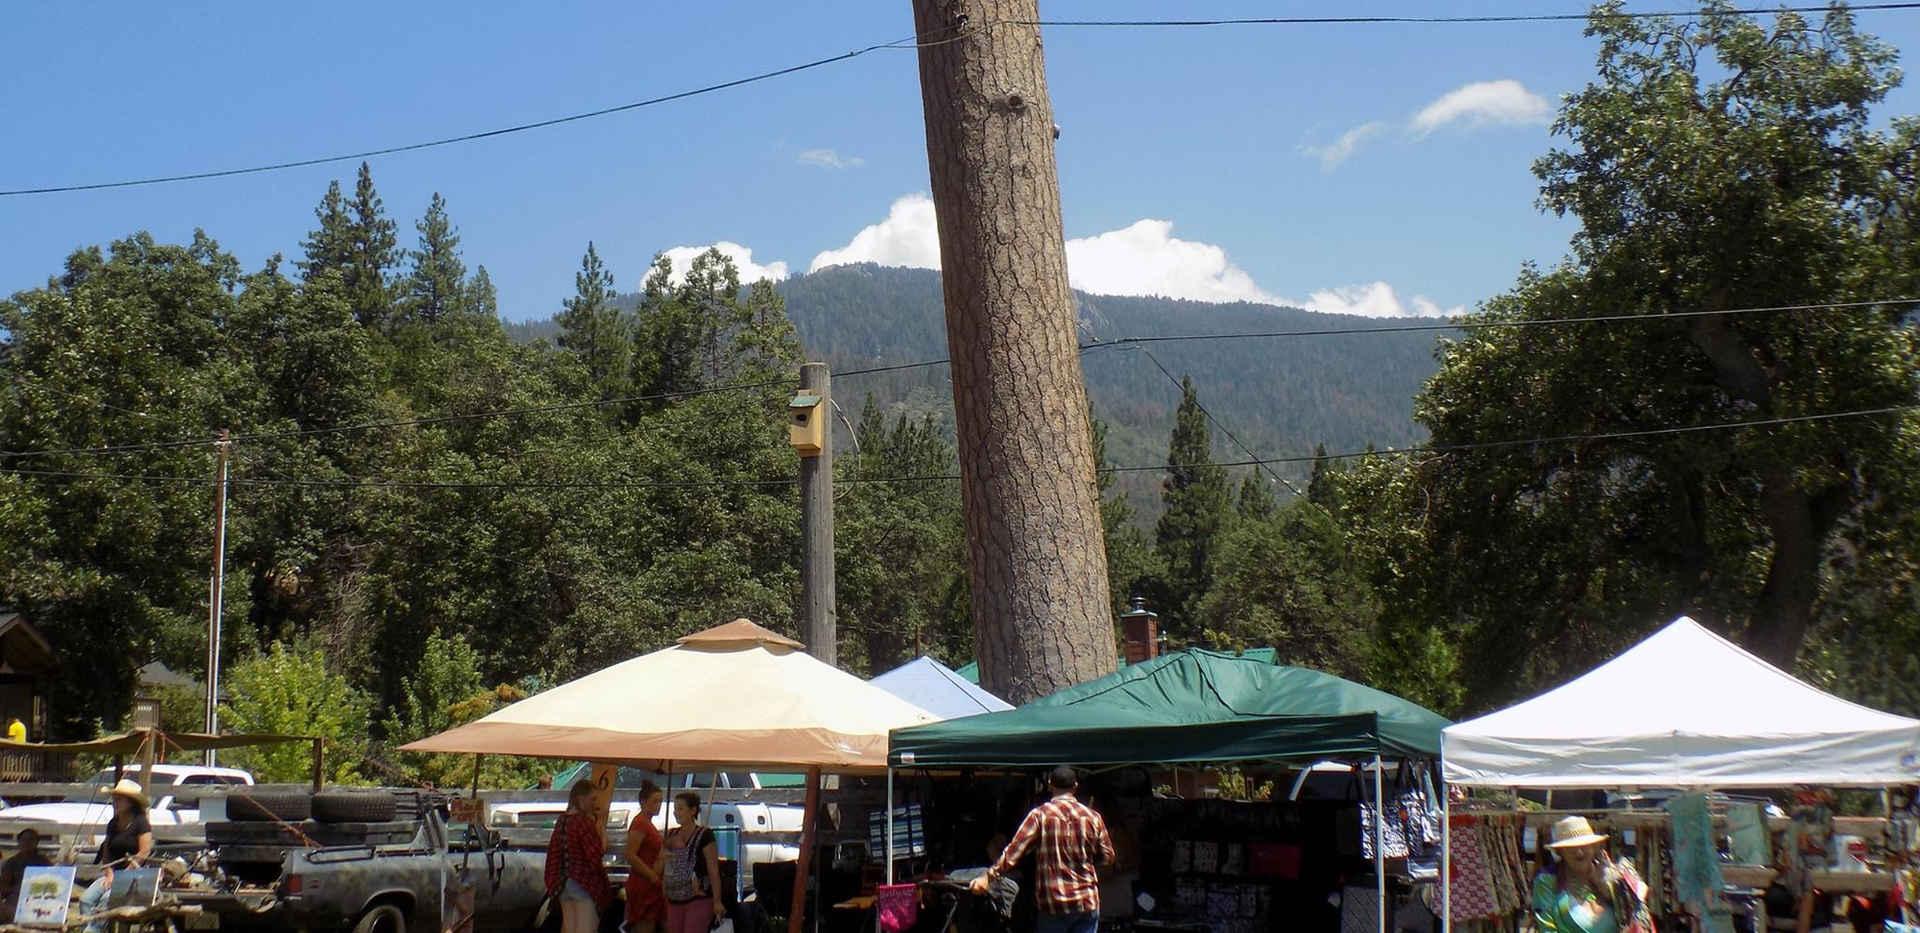 Camp Nelson Mountain Festival Vendors